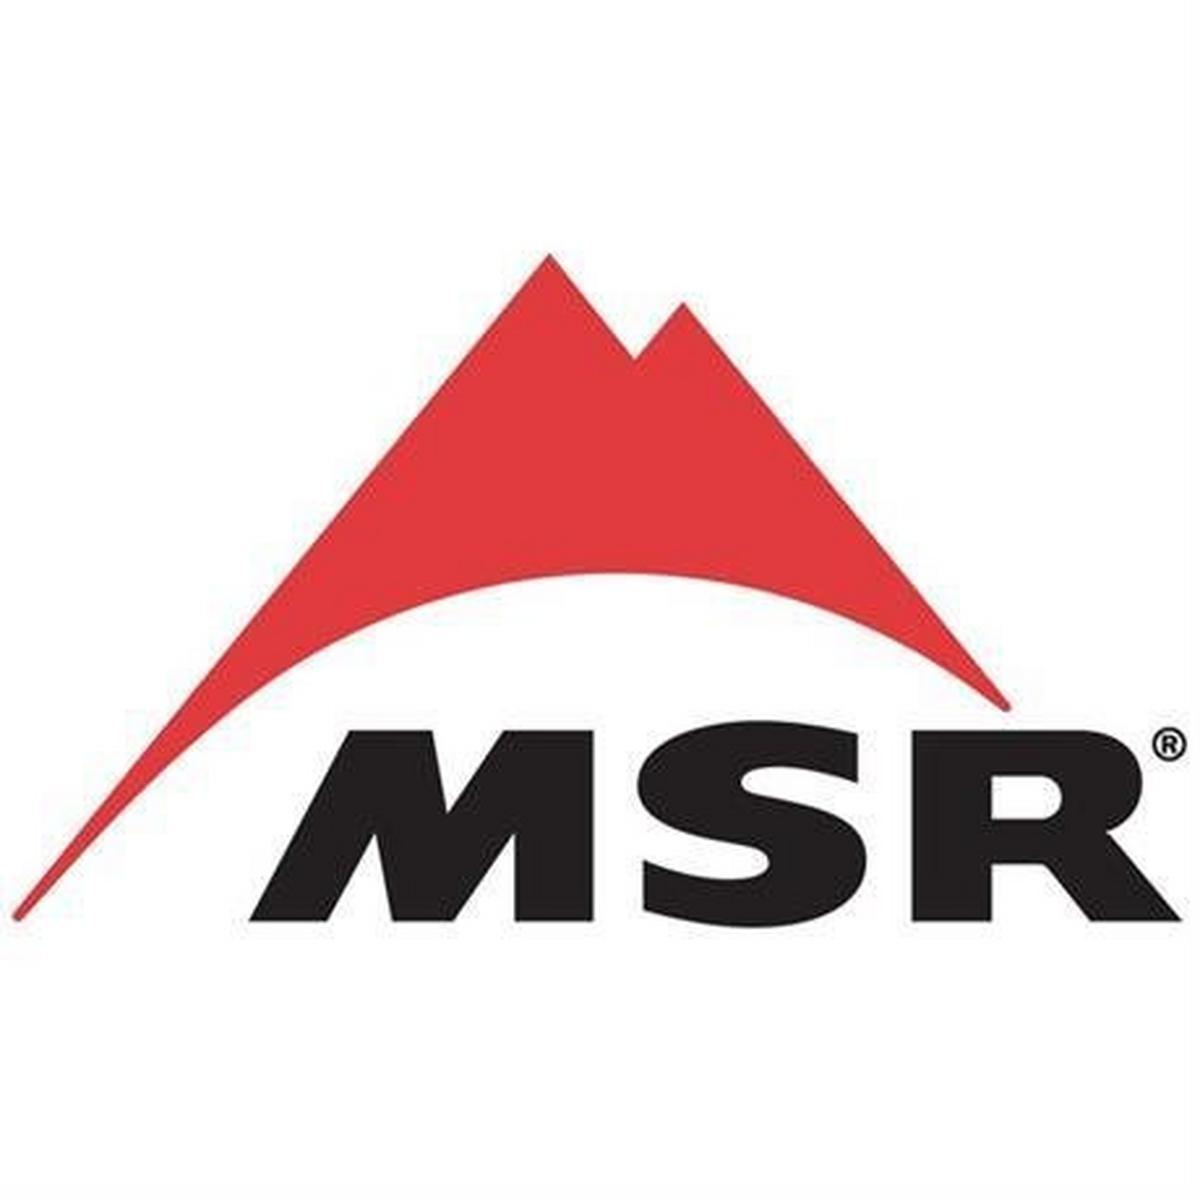 M.s.r. MSR Tent Spare/Accessory: Hubba Tour 1 Footprint